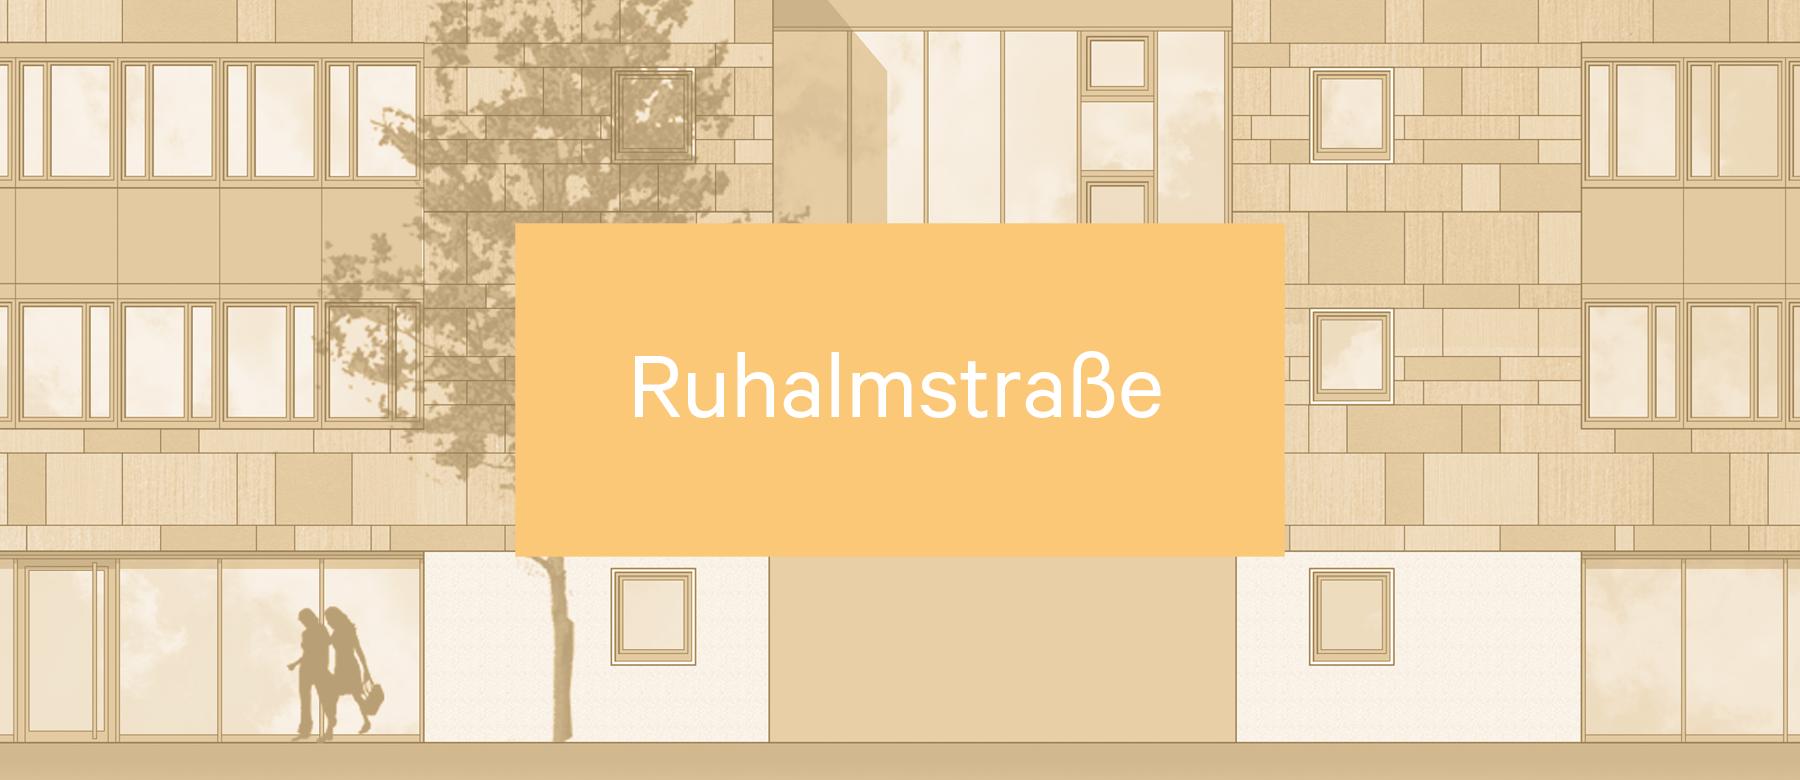 ecoeco_Bauen_Button02_Ruhalmstraße_aktiv